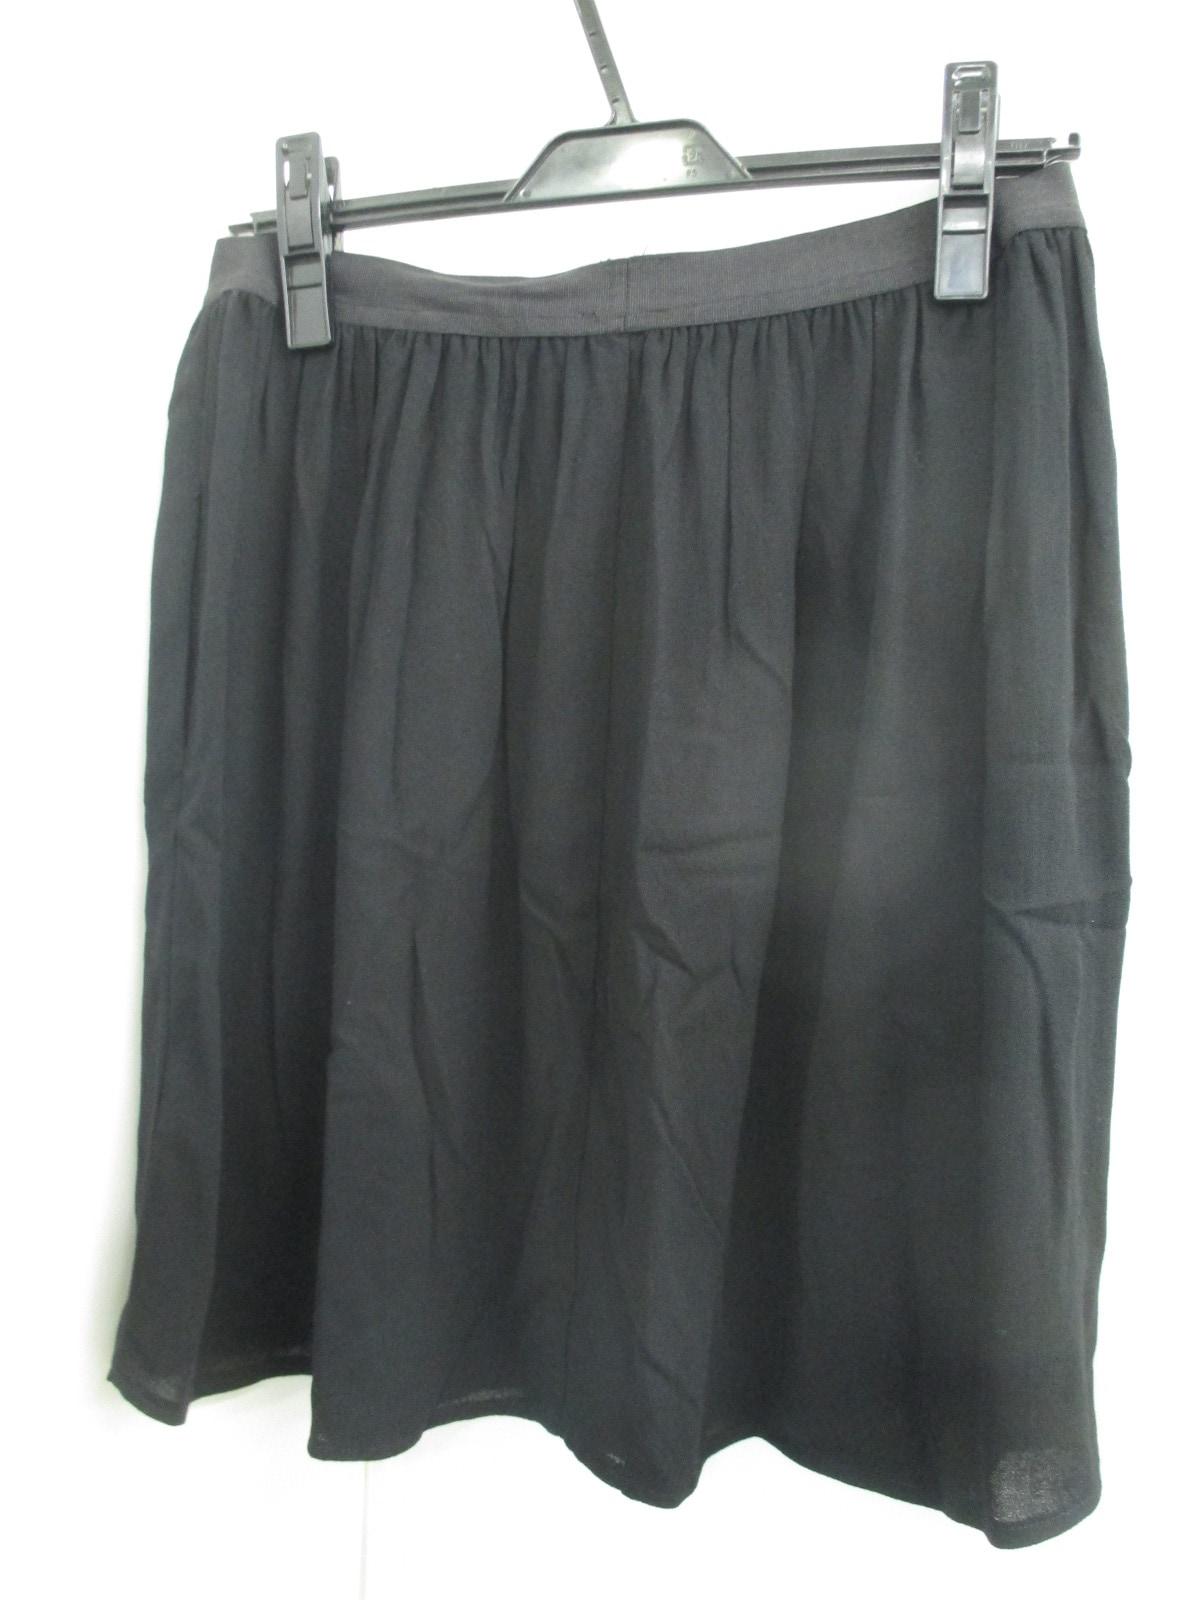 American Vintage(アメリカンヴィンテージ)のスカート